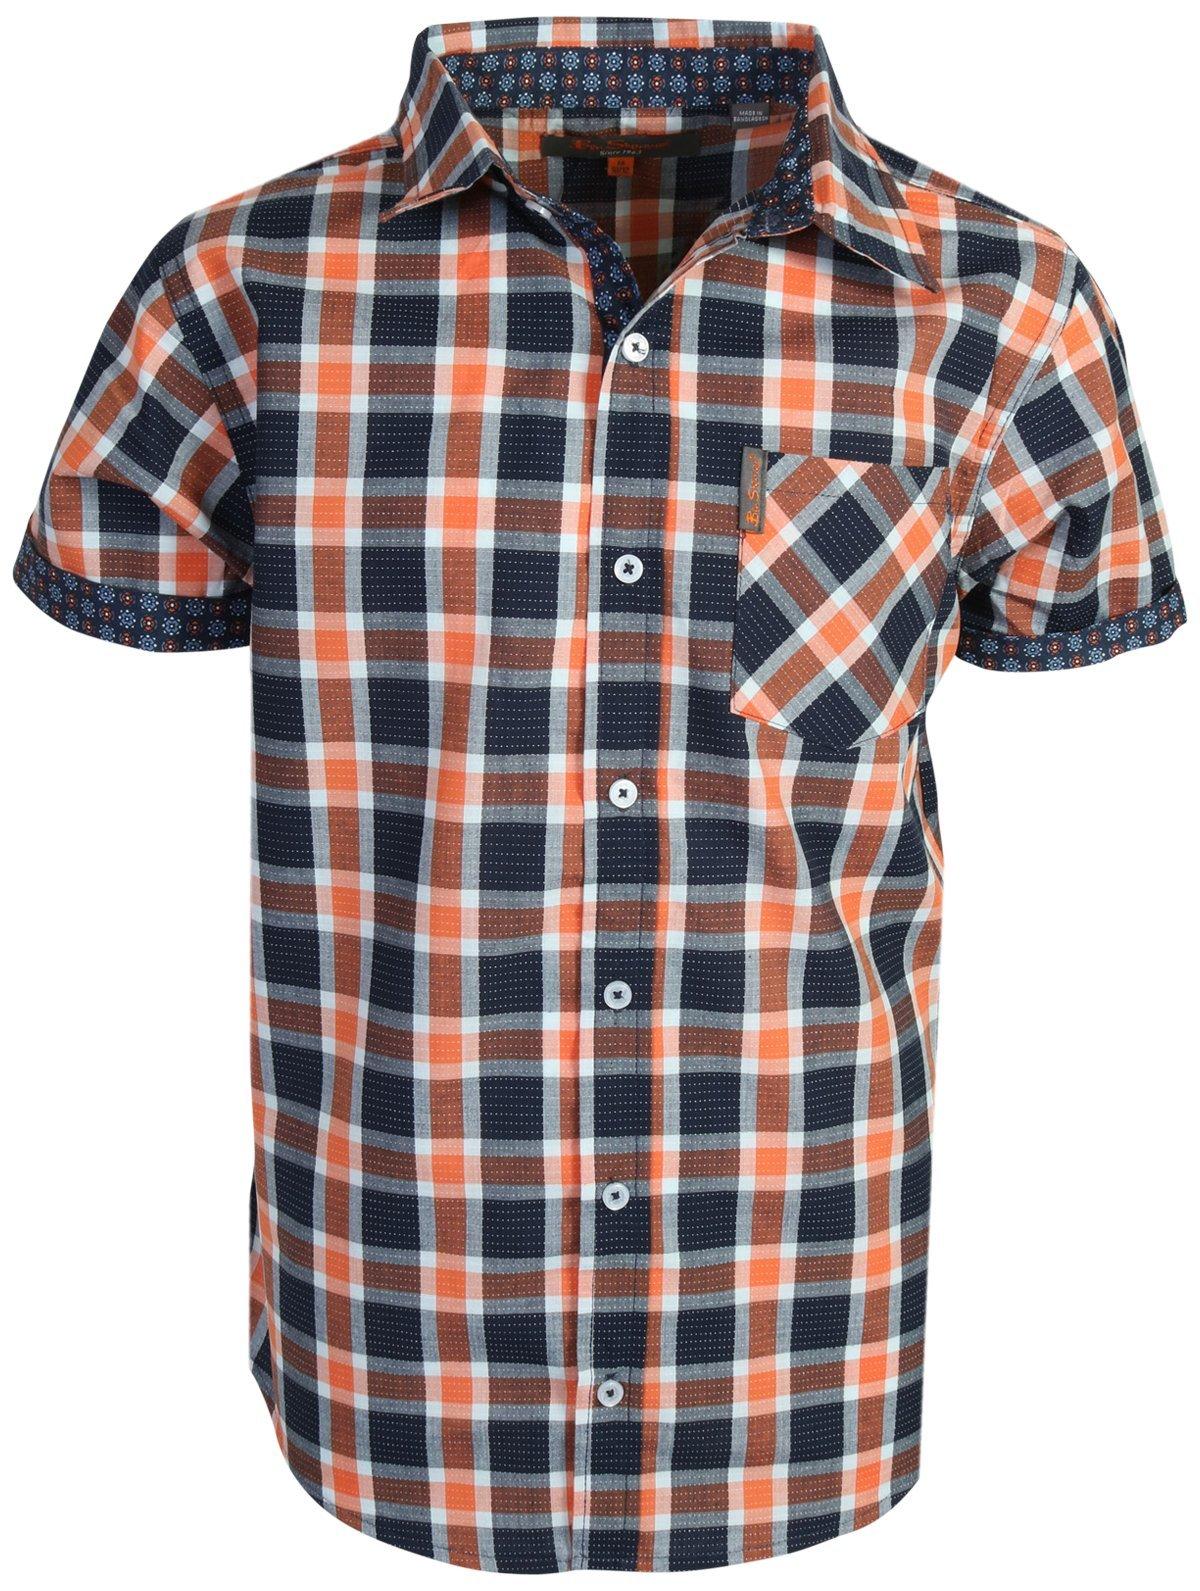 Ben Sherman Boys Short Sleeve Button Down Shirt (Blue Orange/Dobby, 10/12)'